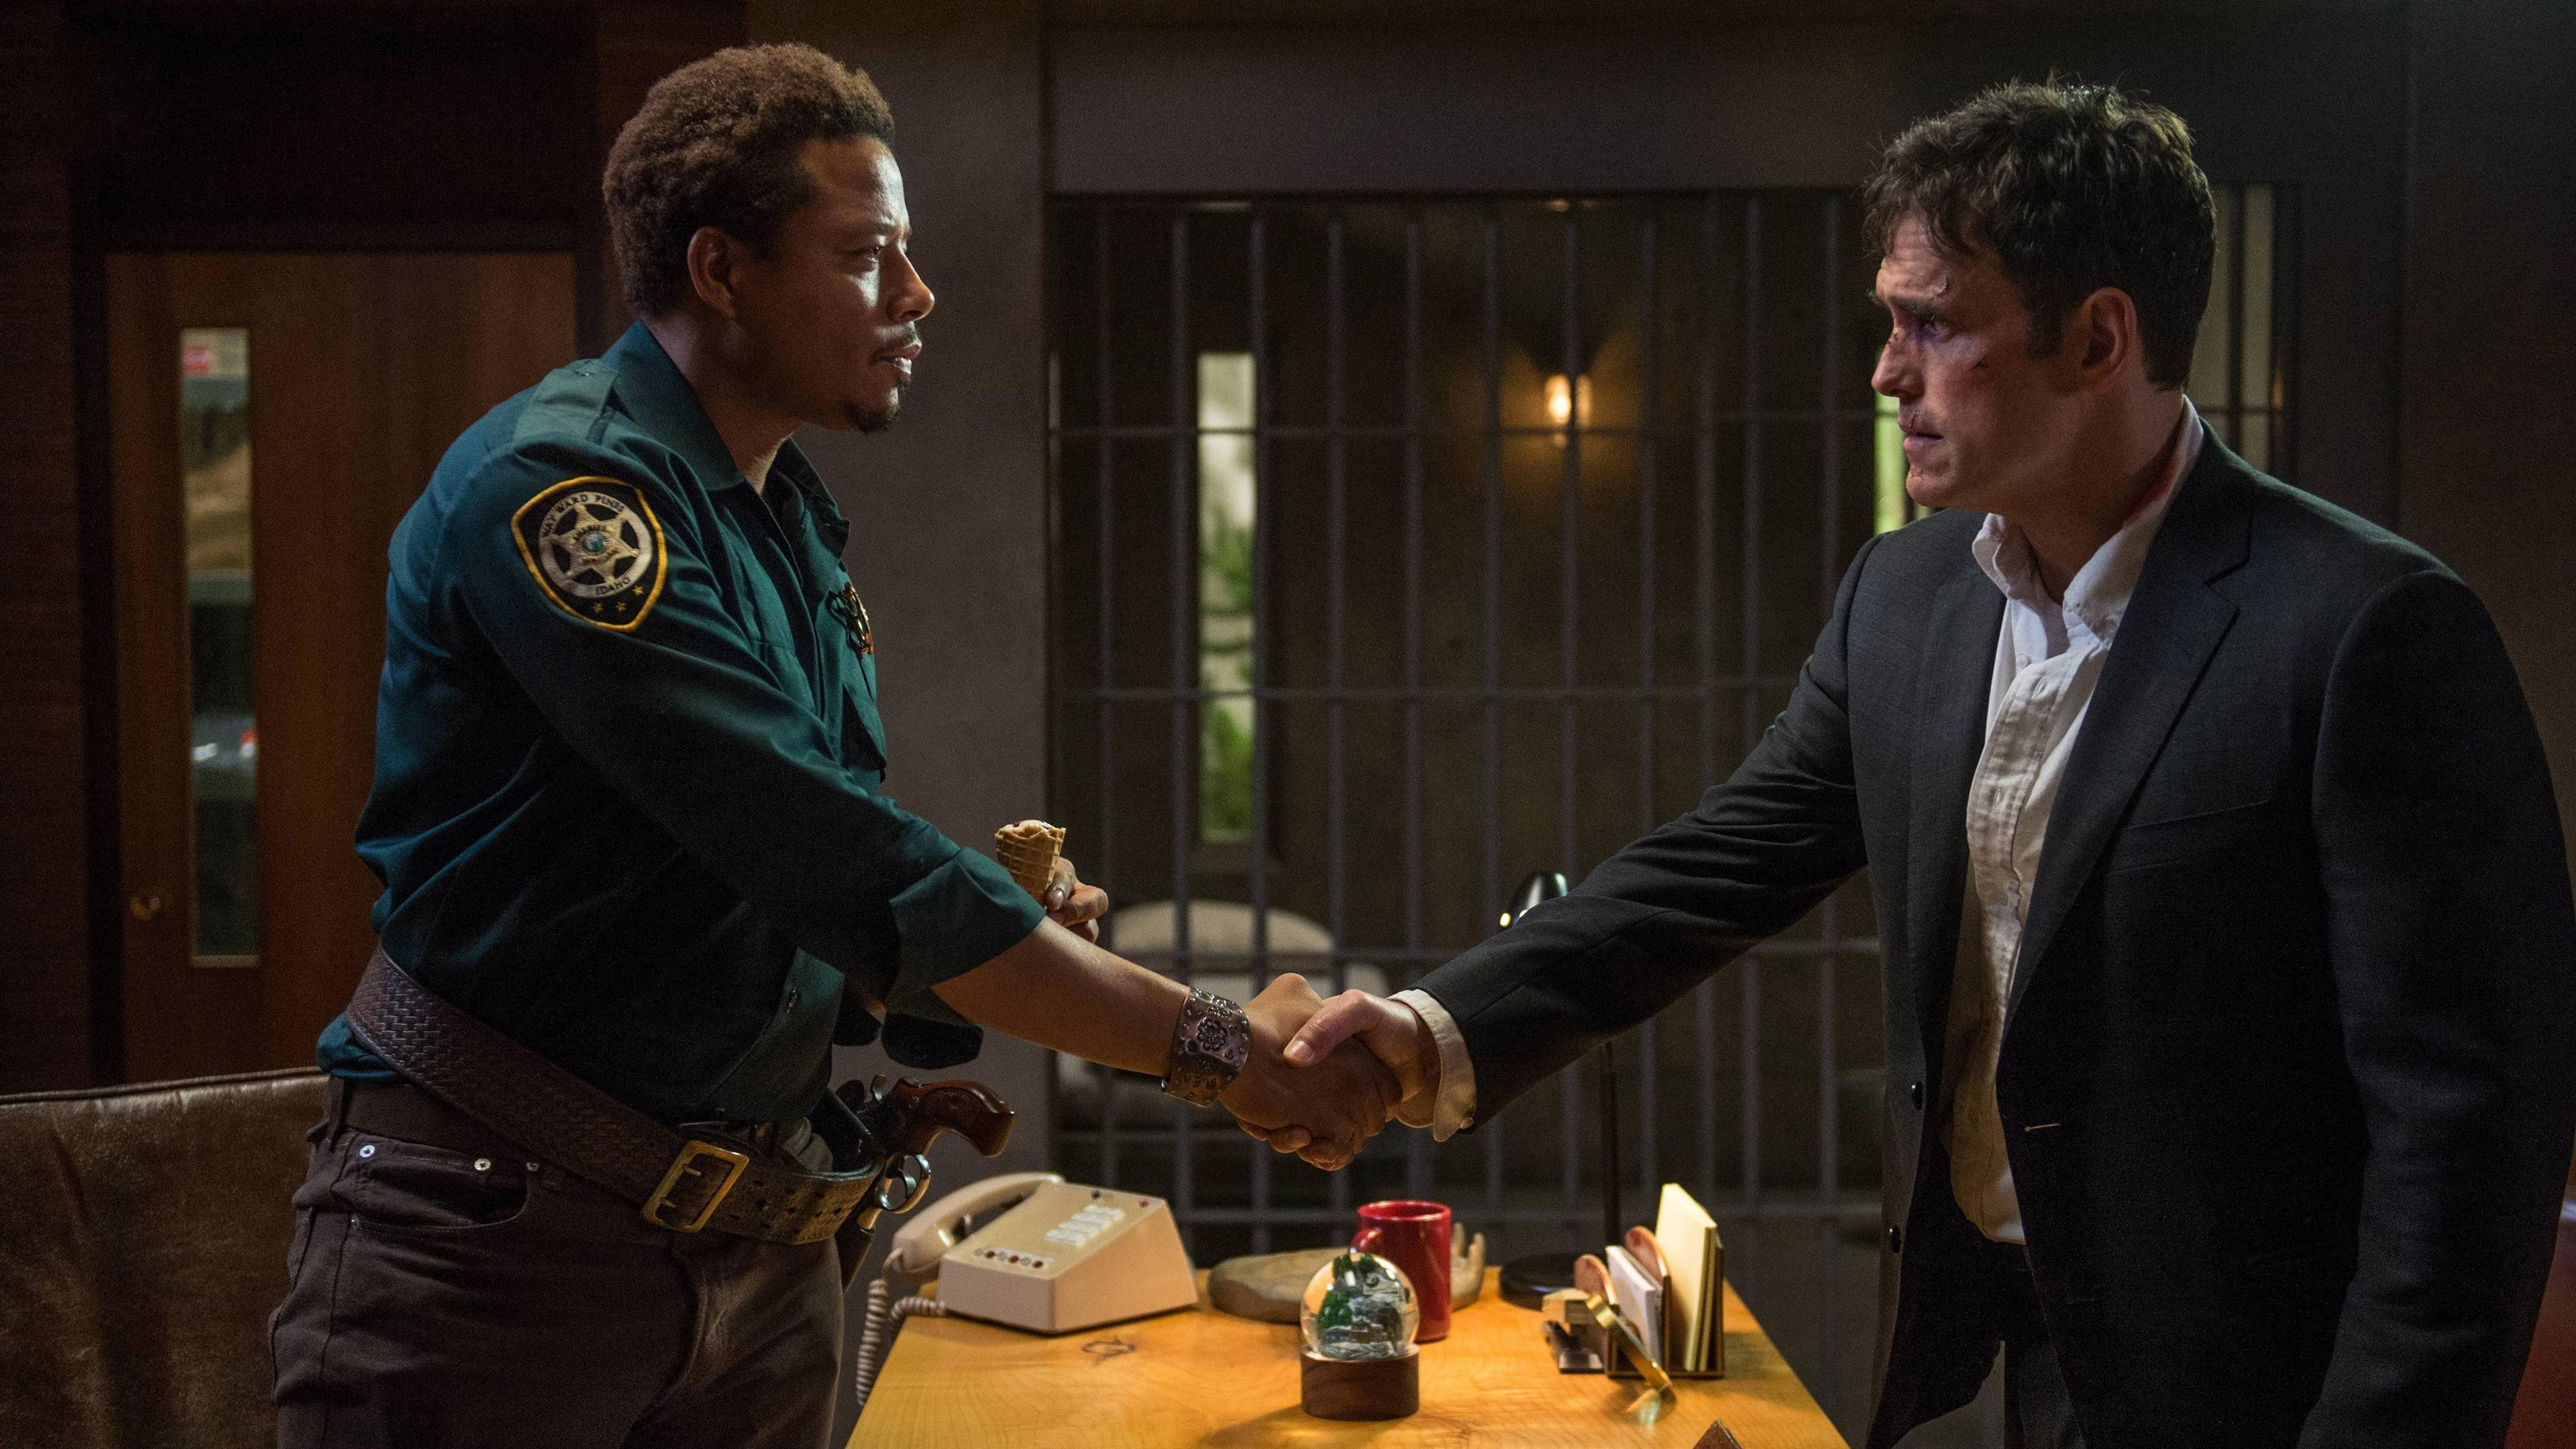 Ver Wayward Pines 1x1 Online Español Latino